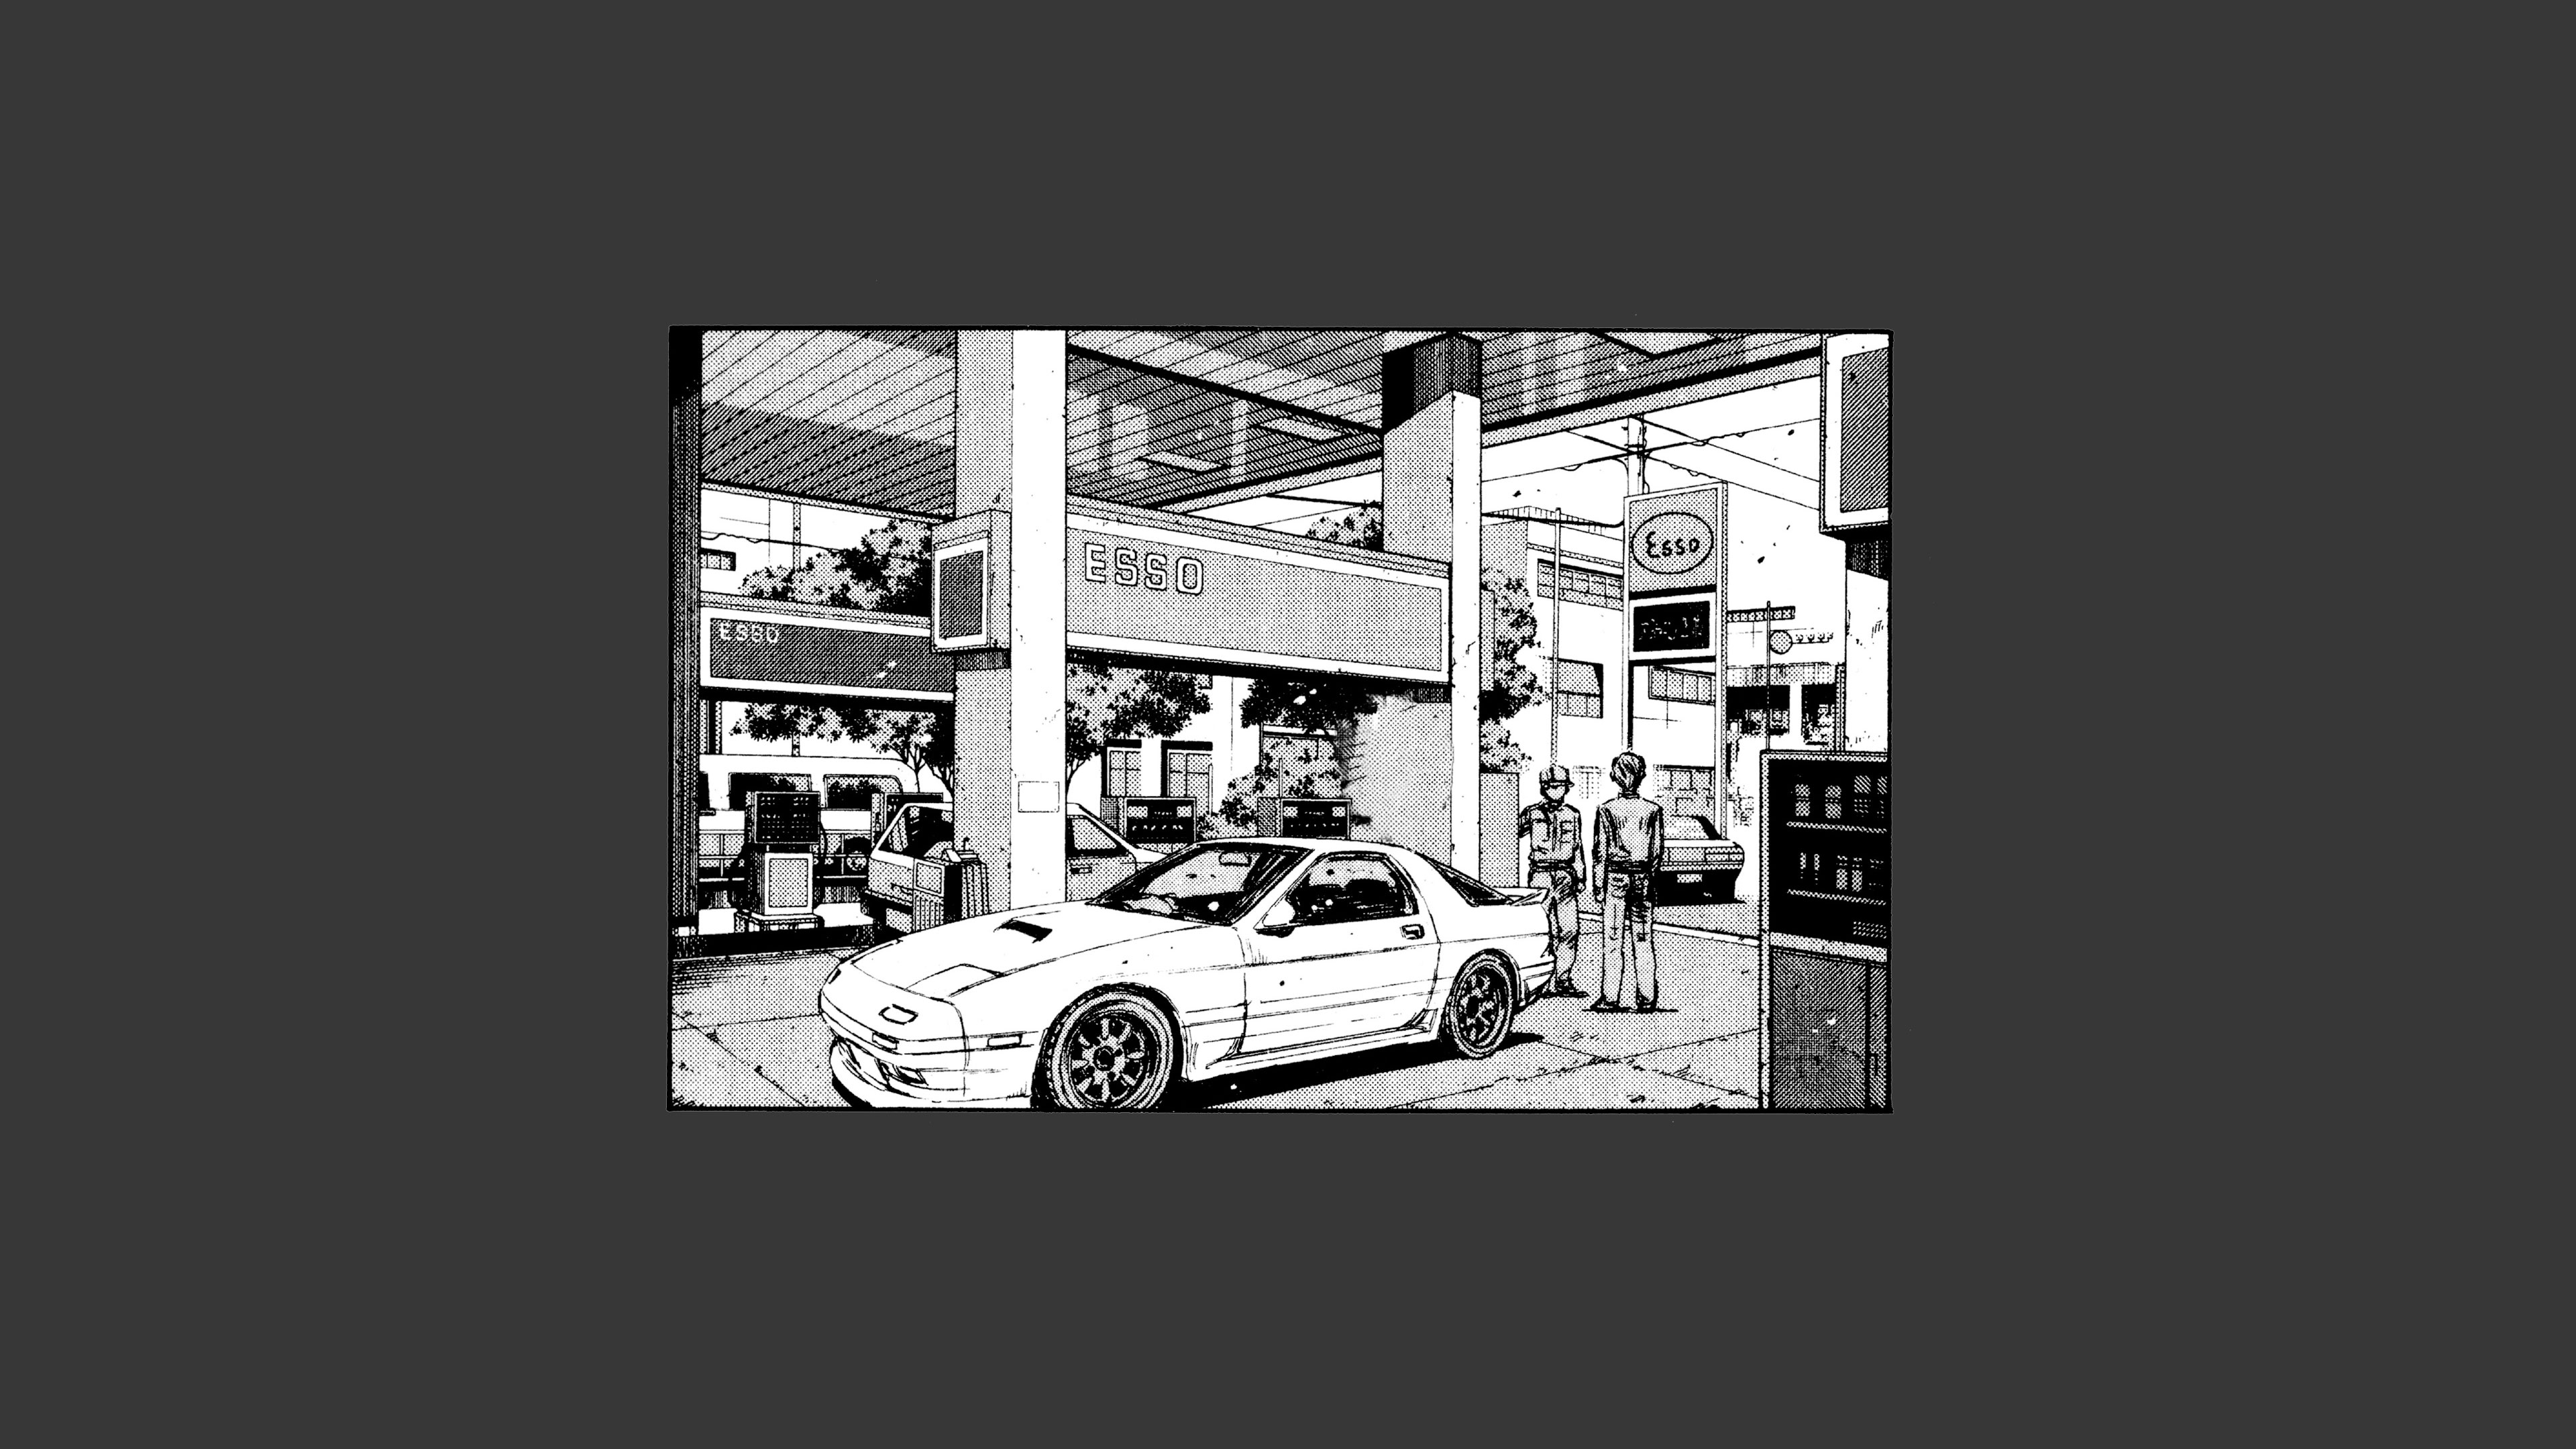 Anime 3840x2160 Initial D Mitsubishi Lancer Evo V car artwork white cars gray background gray gas station drawing